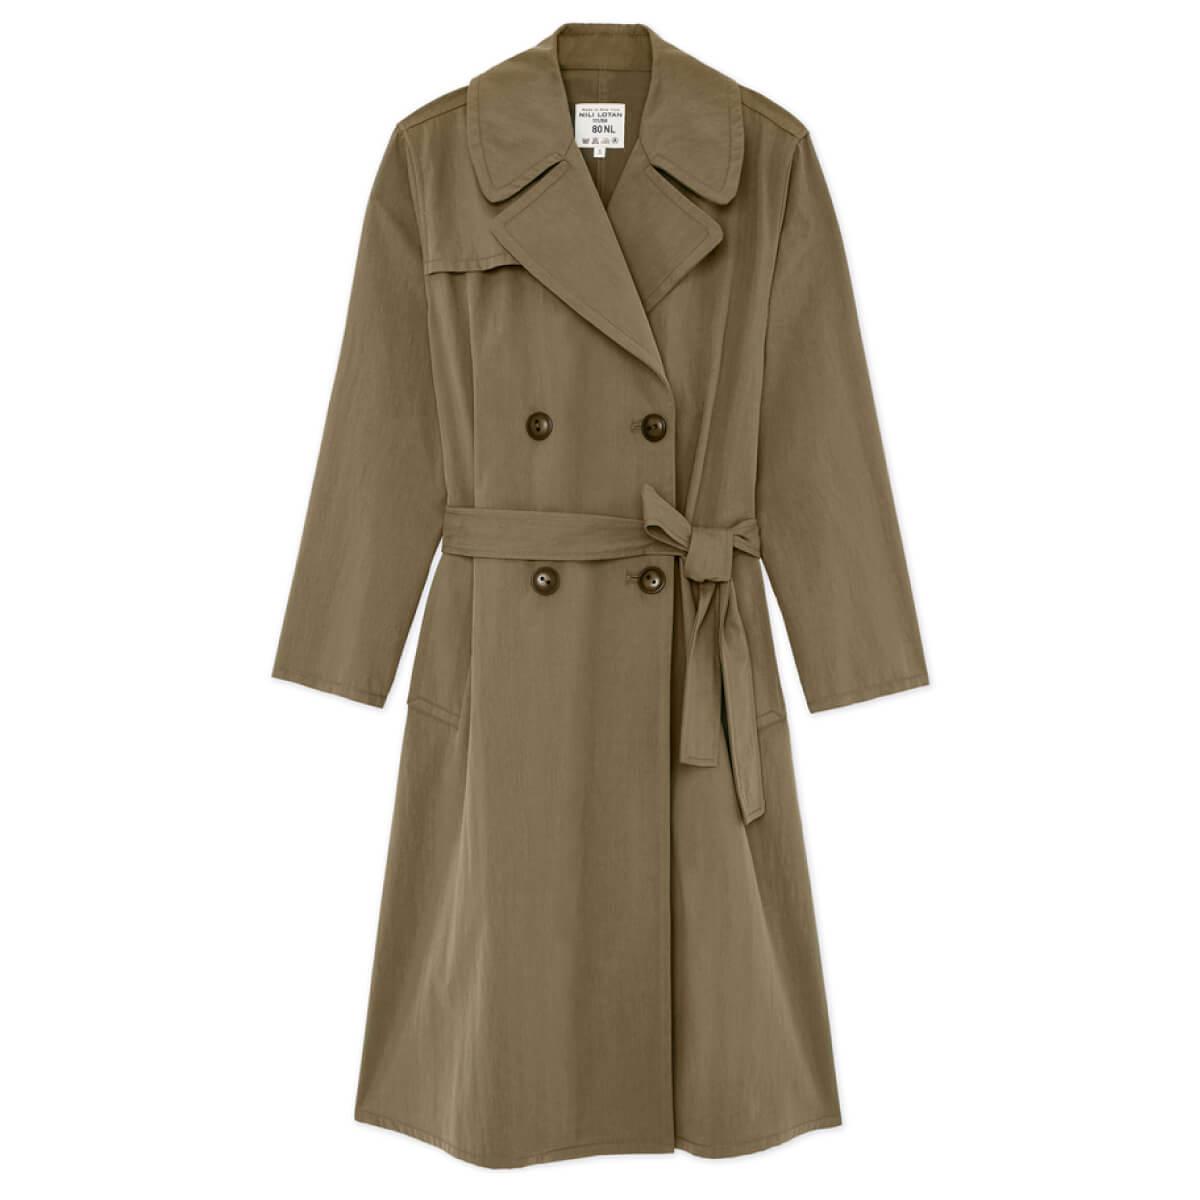 Nili Lotan Coat